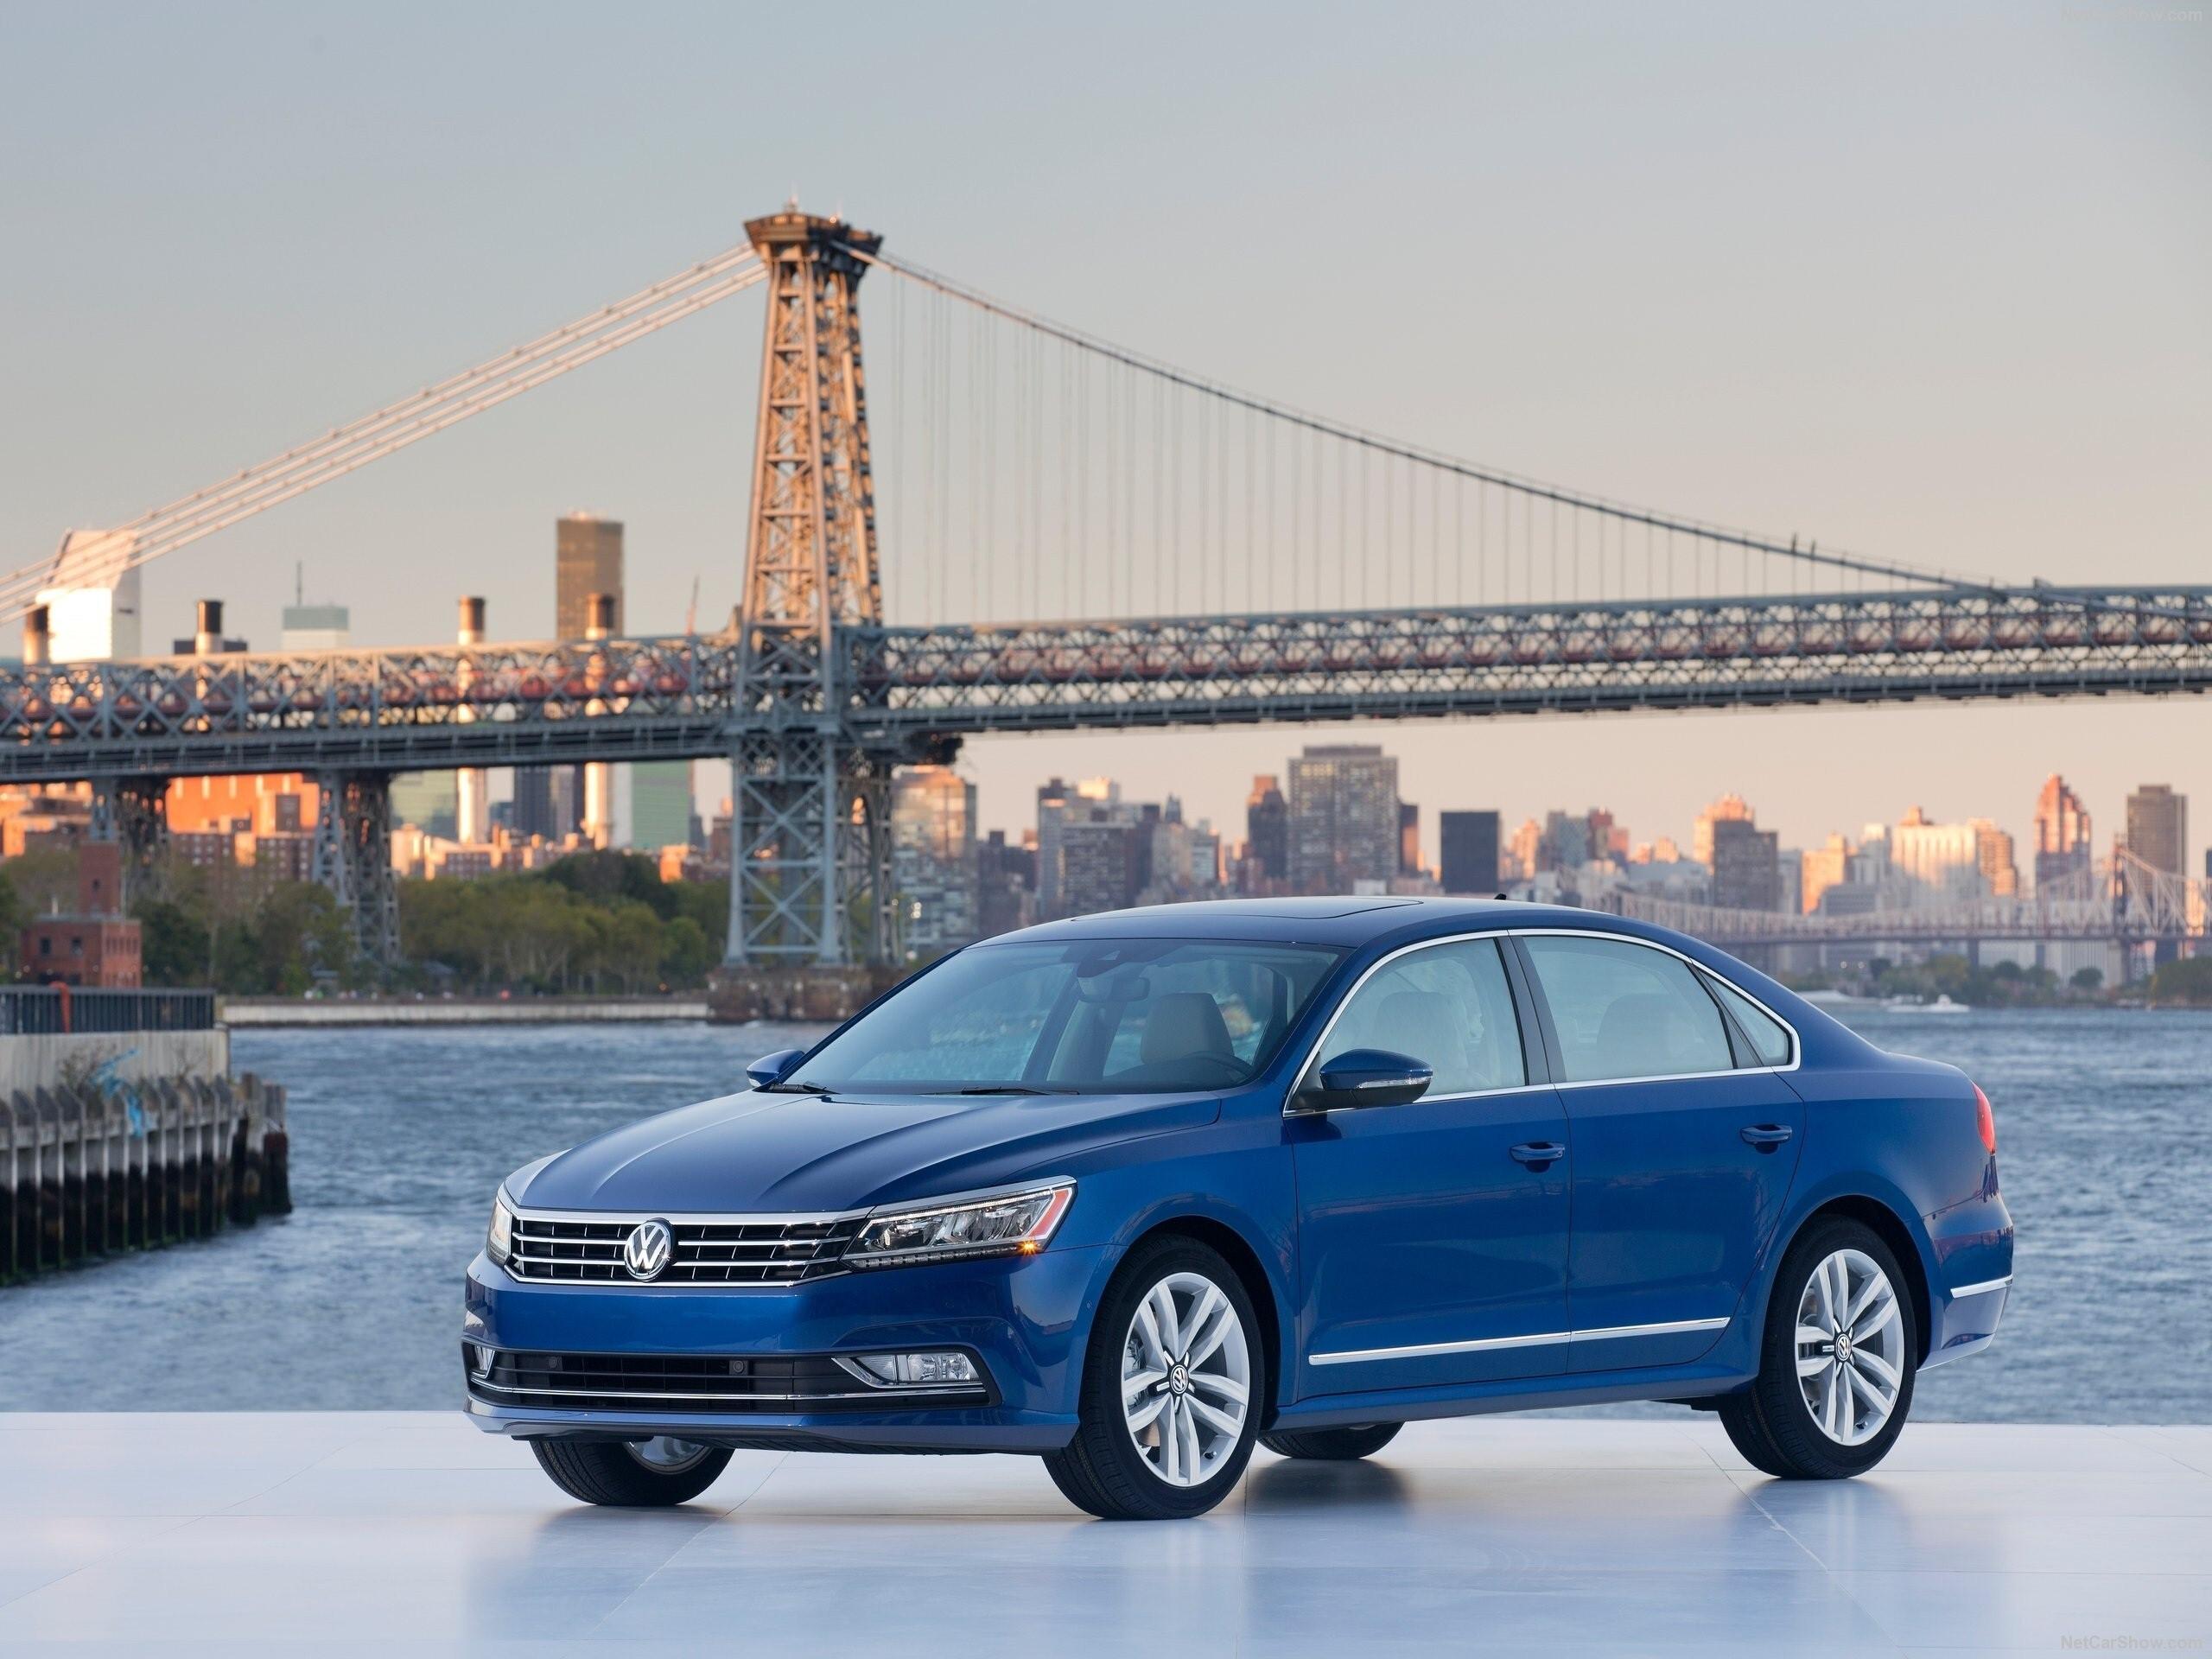 Blue Volkswagen Passat 2017 Car Hd Wallpaper Hd Wallpapers